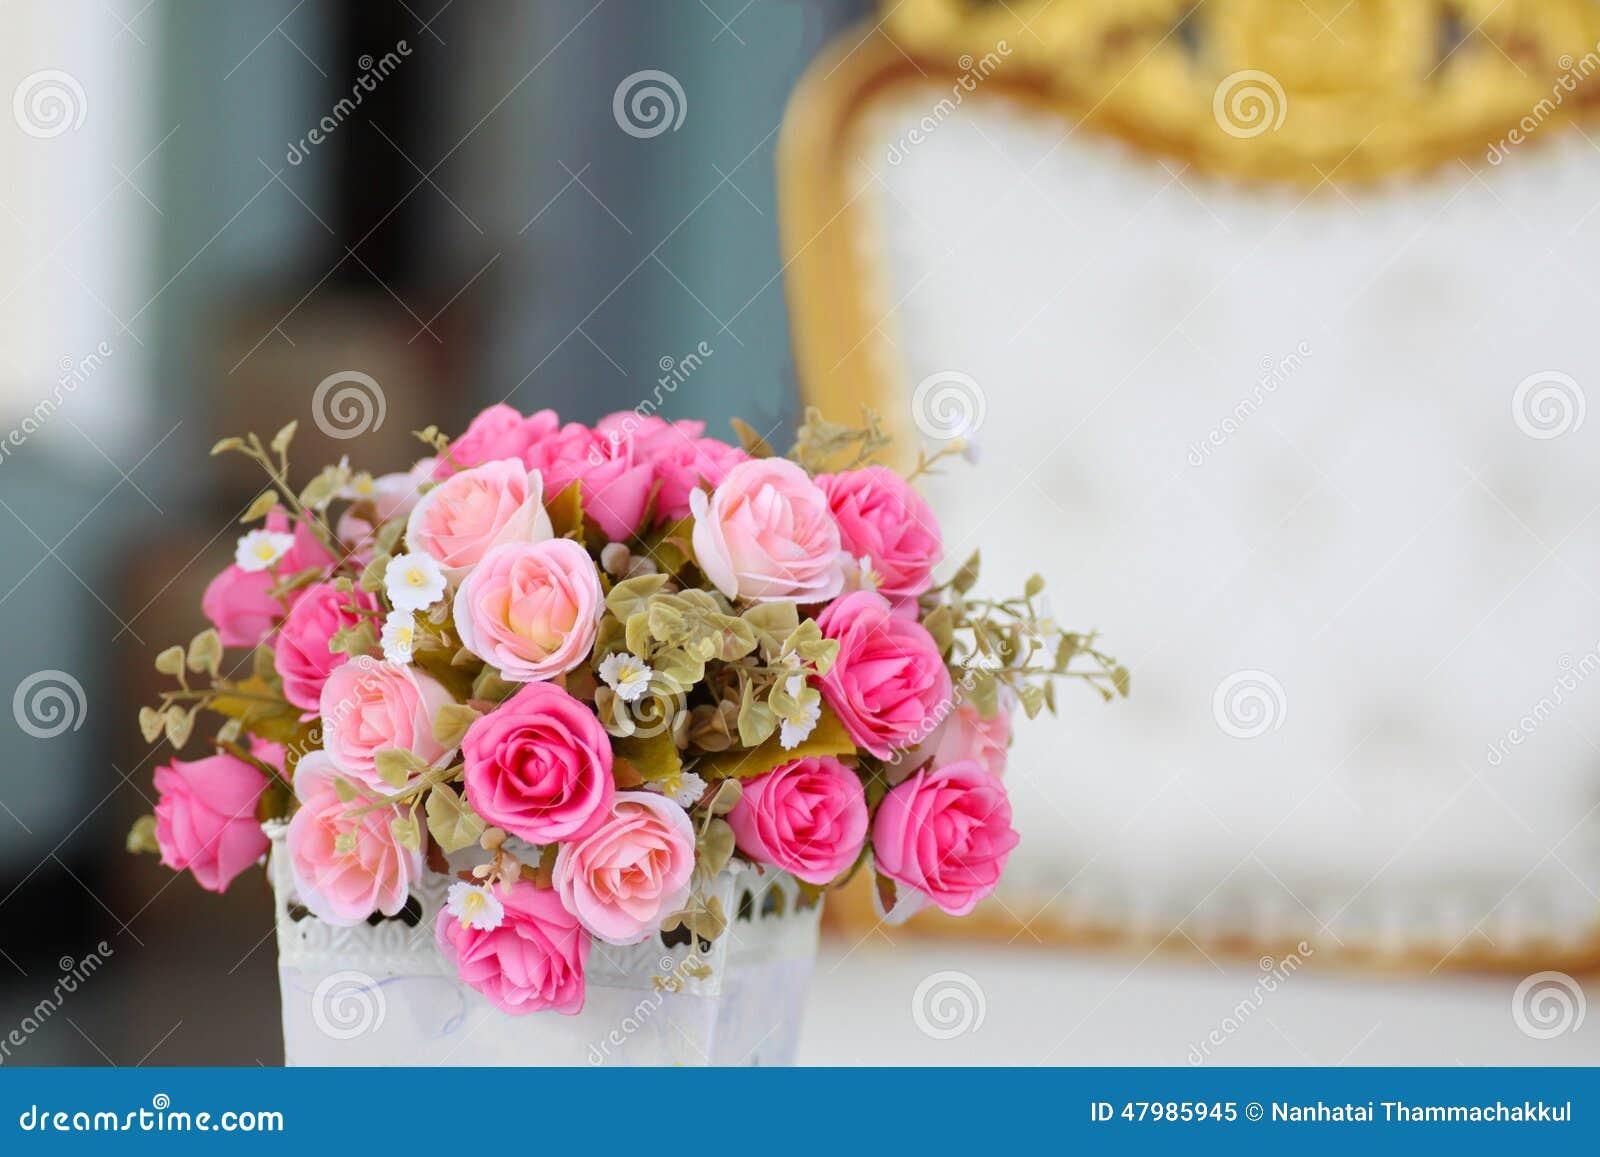 Ramo de rosas rosadas minúsculas